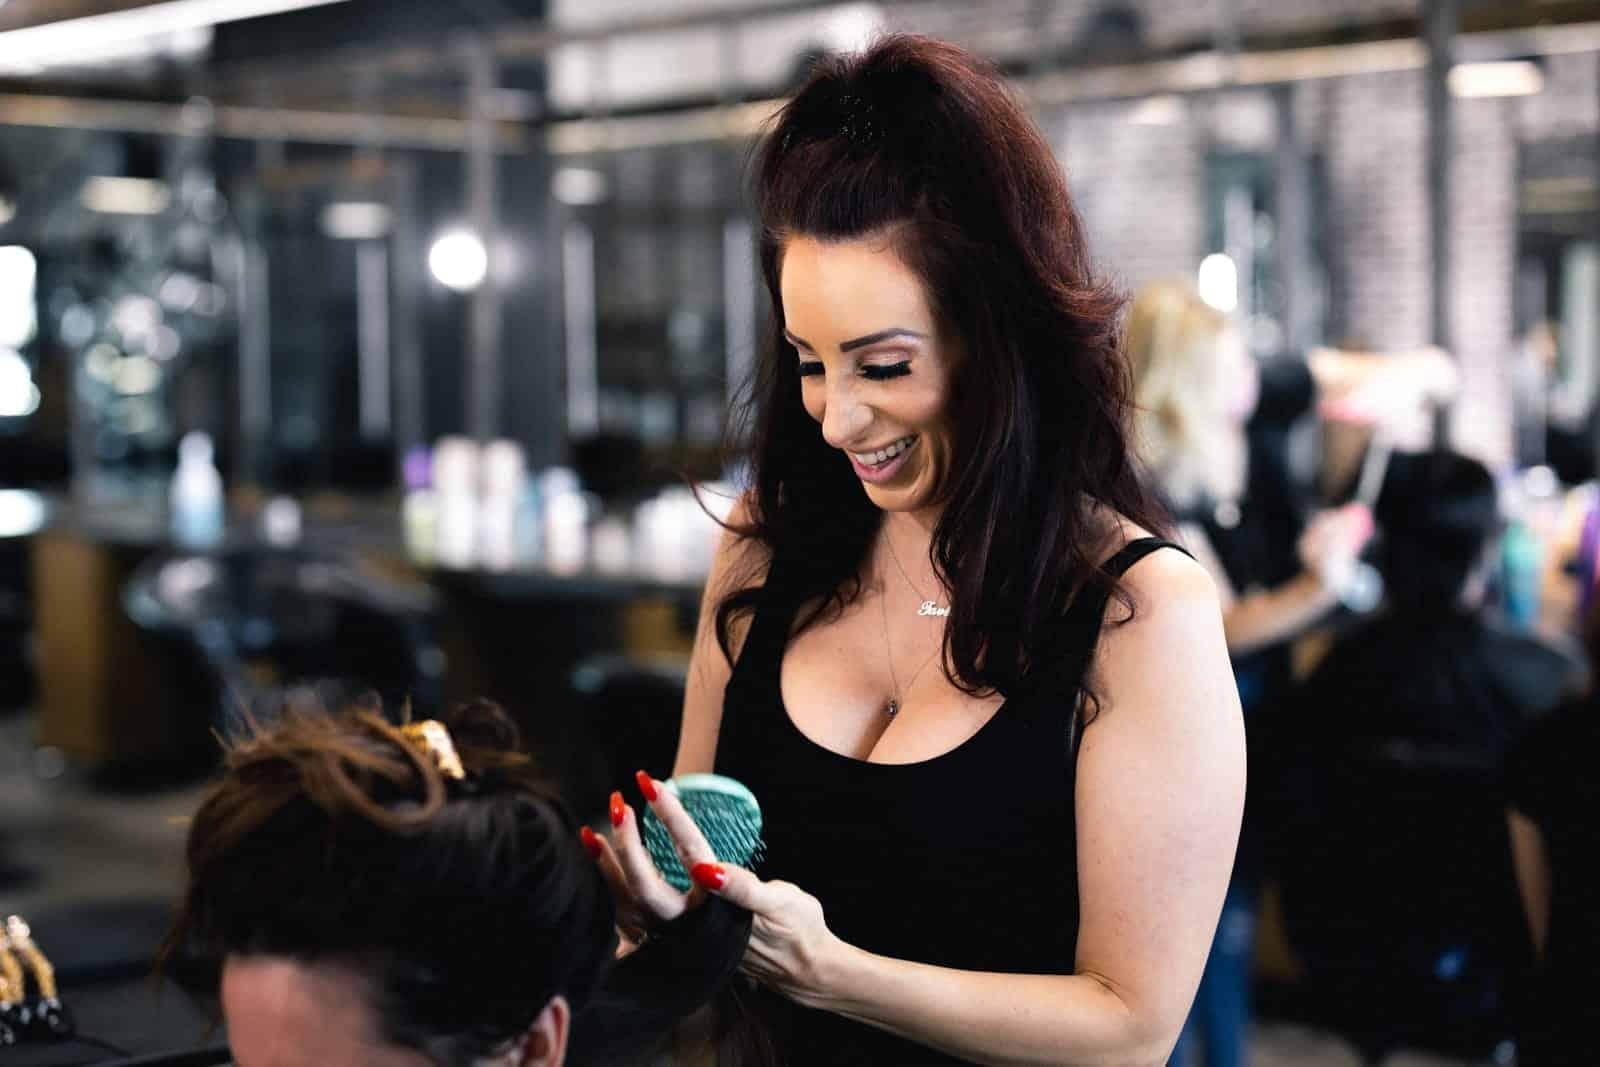 Hair stylist Amanda Stanley